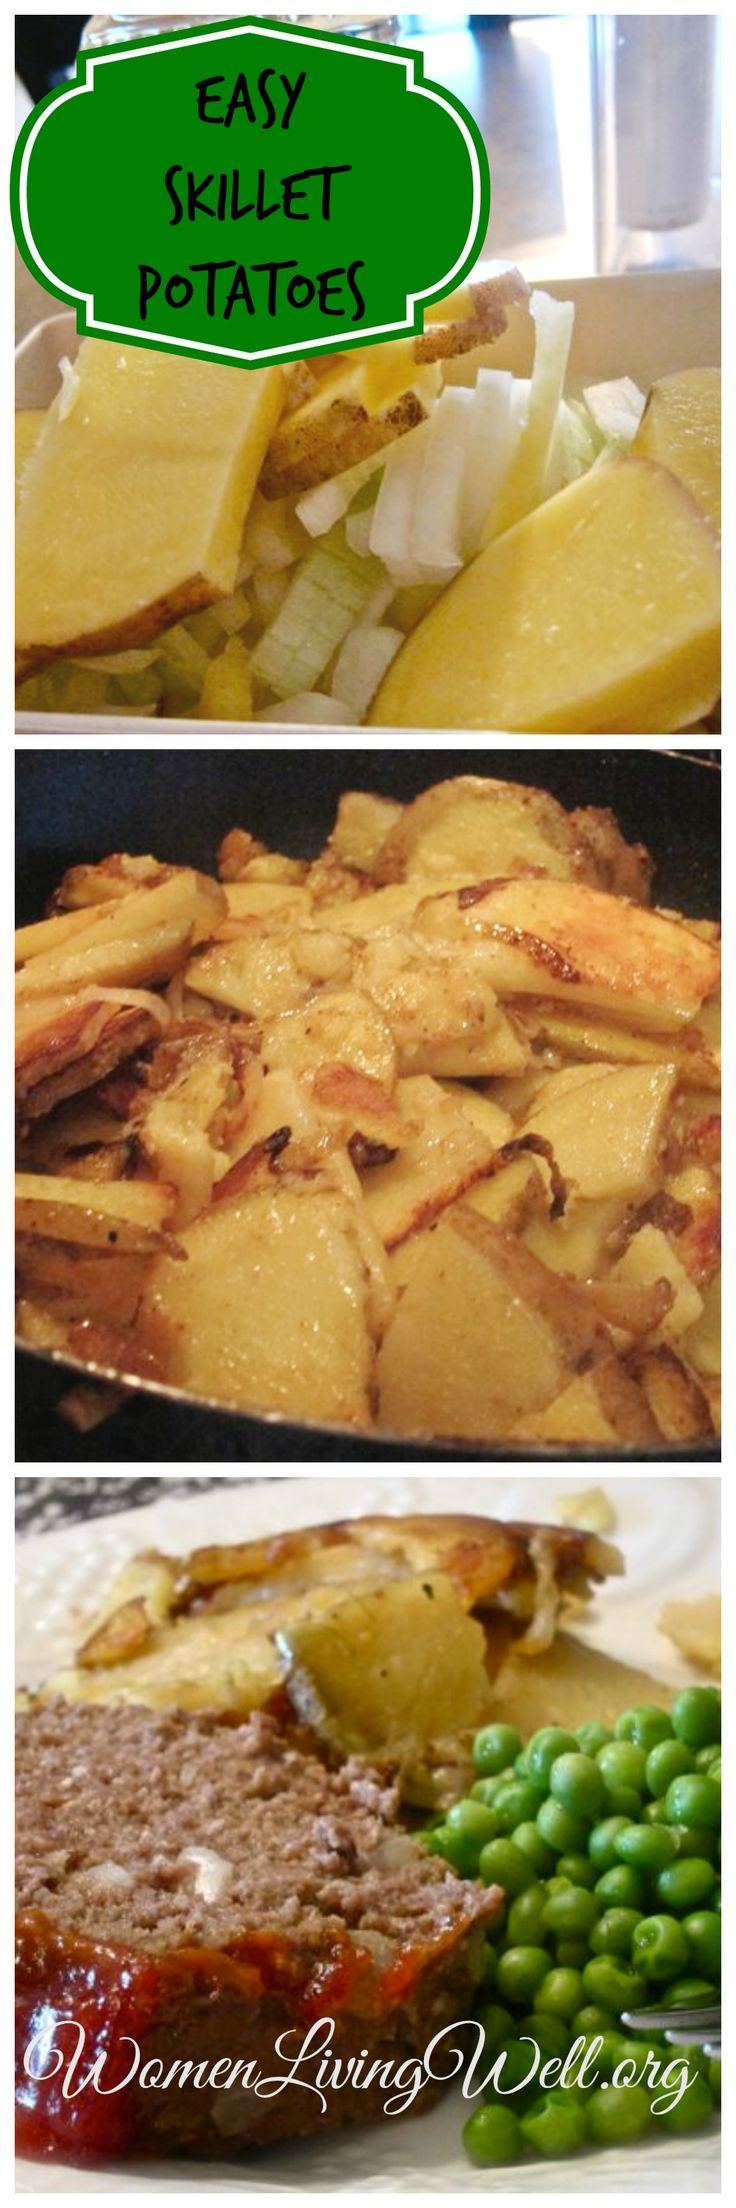 Easy Skillet Potatoes